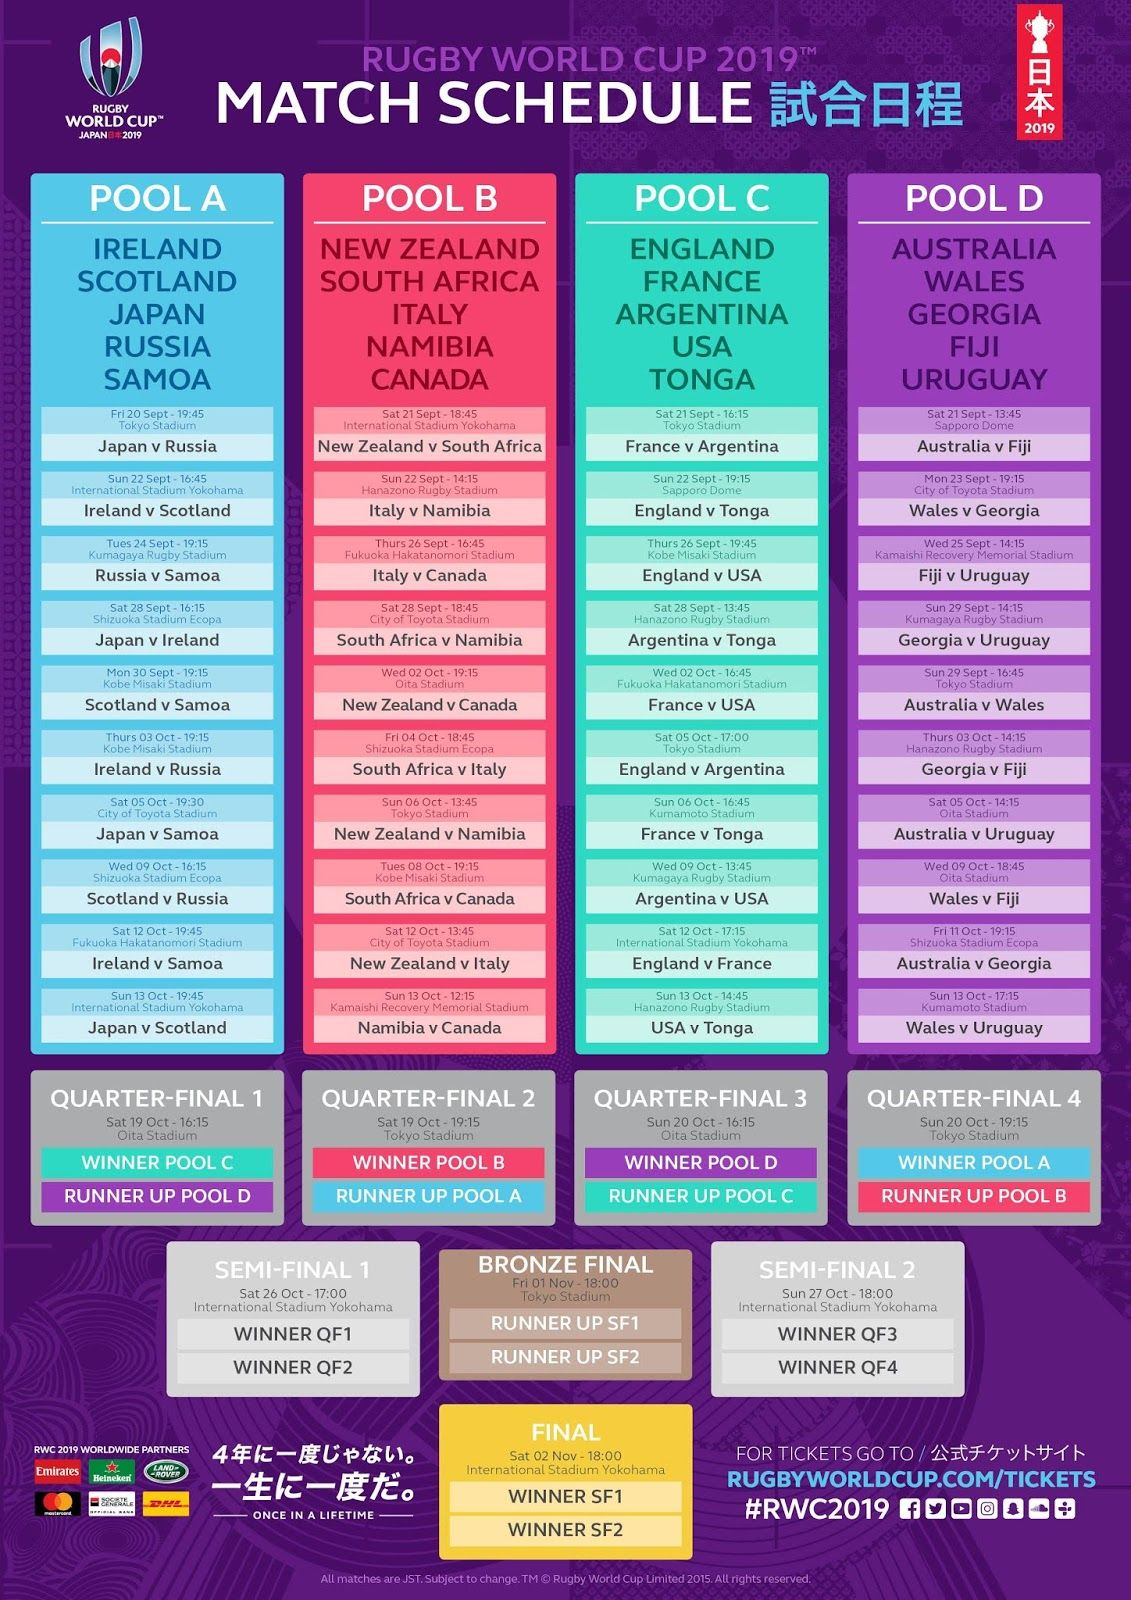 Rugby World Cup 2019 Rwc Match Schedule Japan 2019 Rwc2019 World Cup Fixtures World Cup Match World Cup Schedule